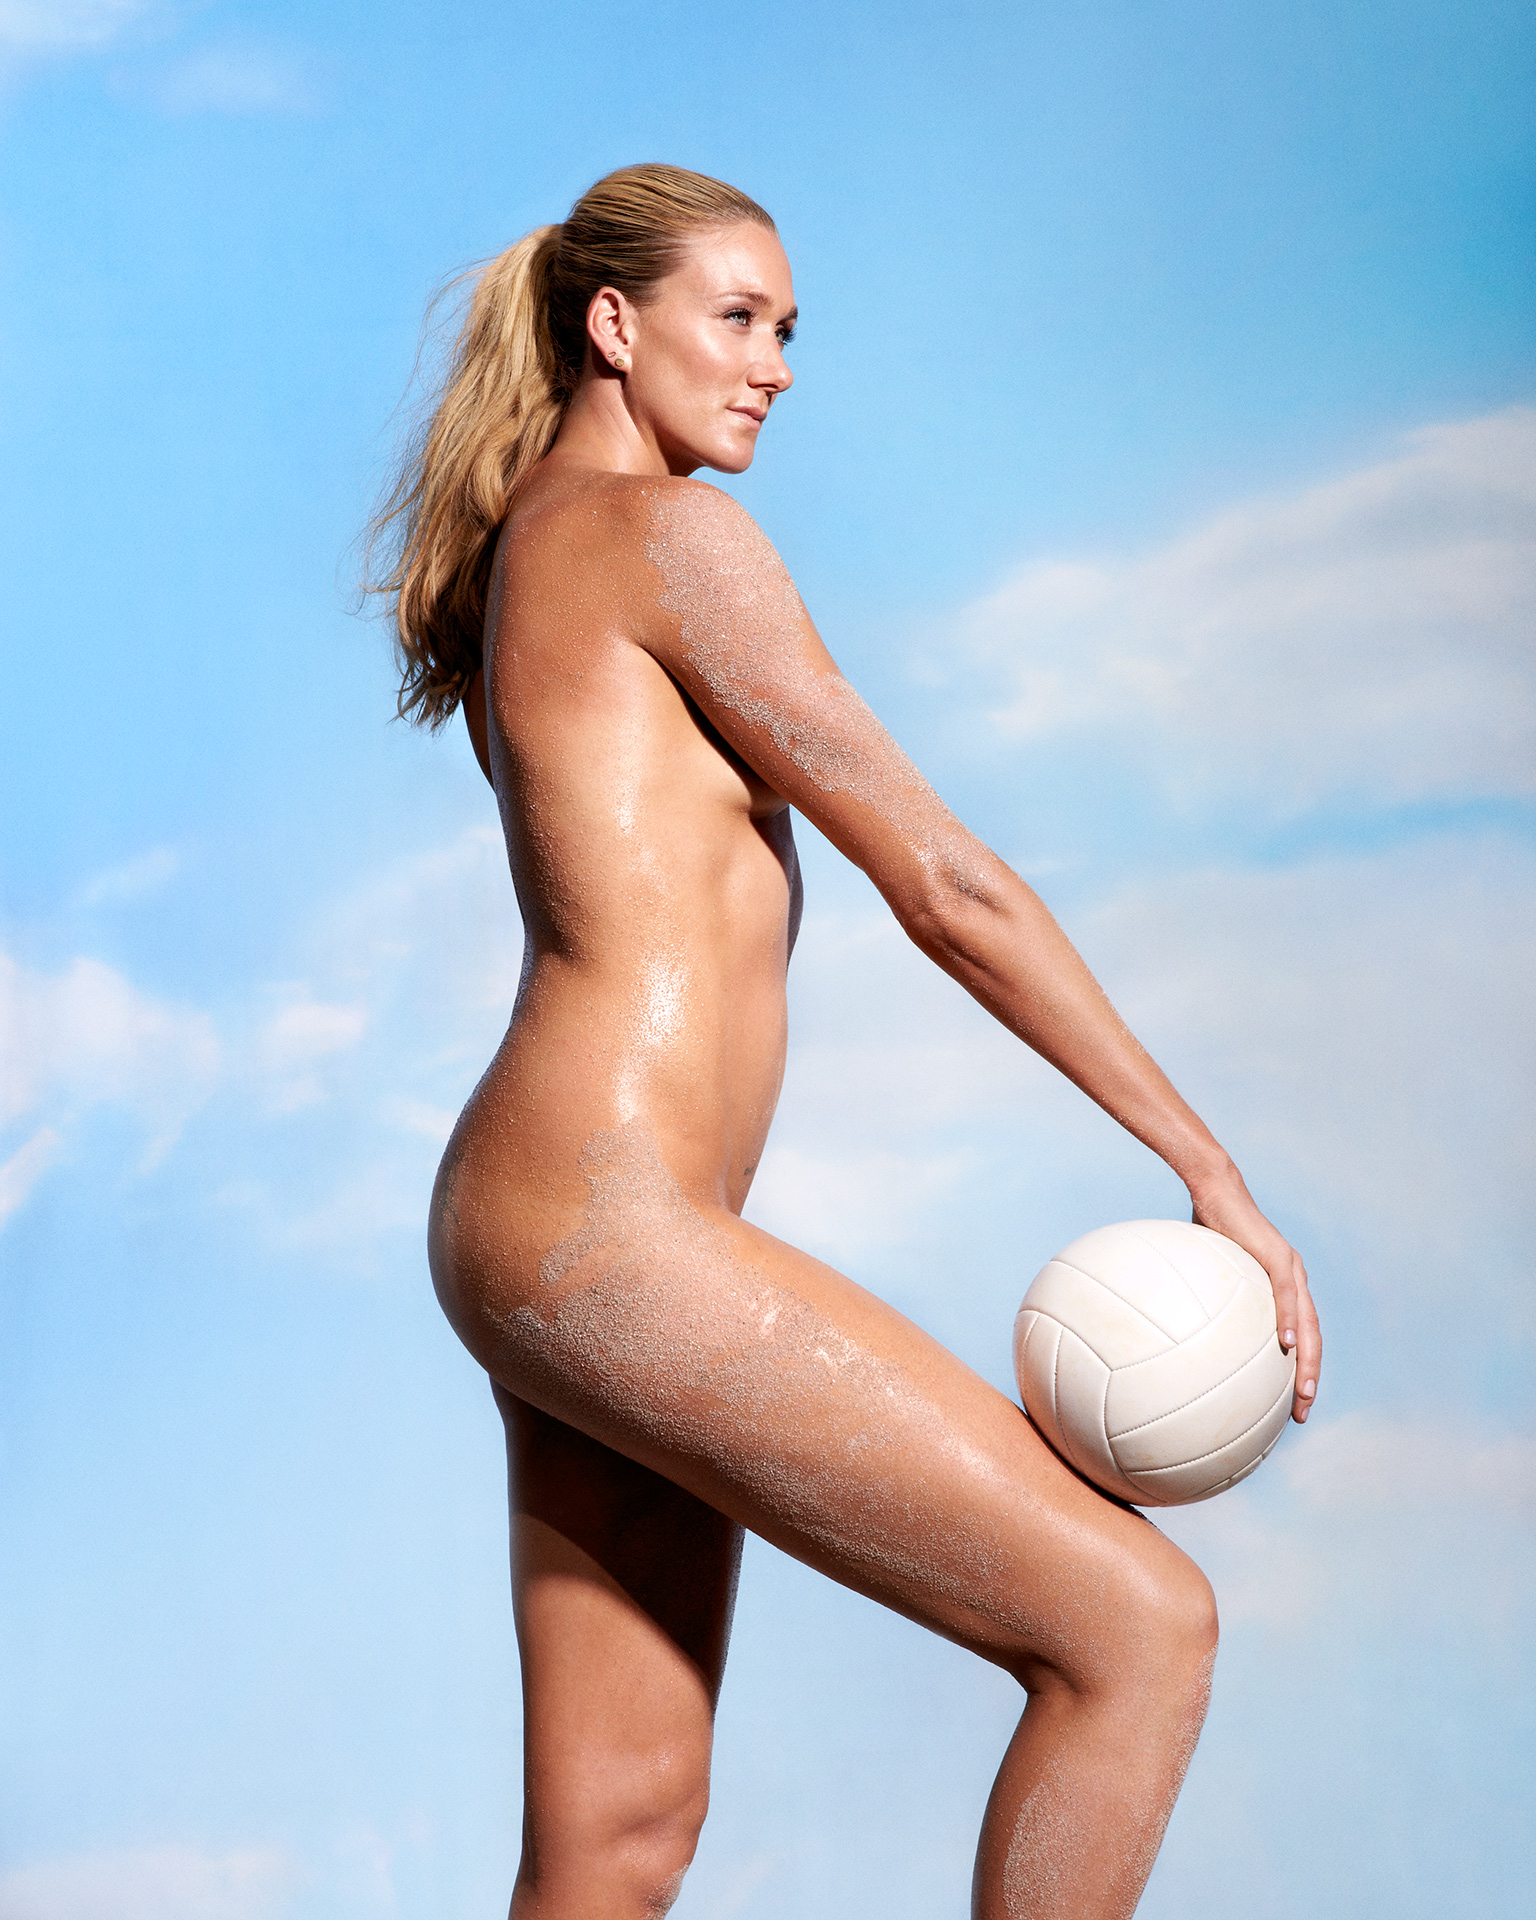 Las voleibolistas Kerri Walsh Jennings & Misty May